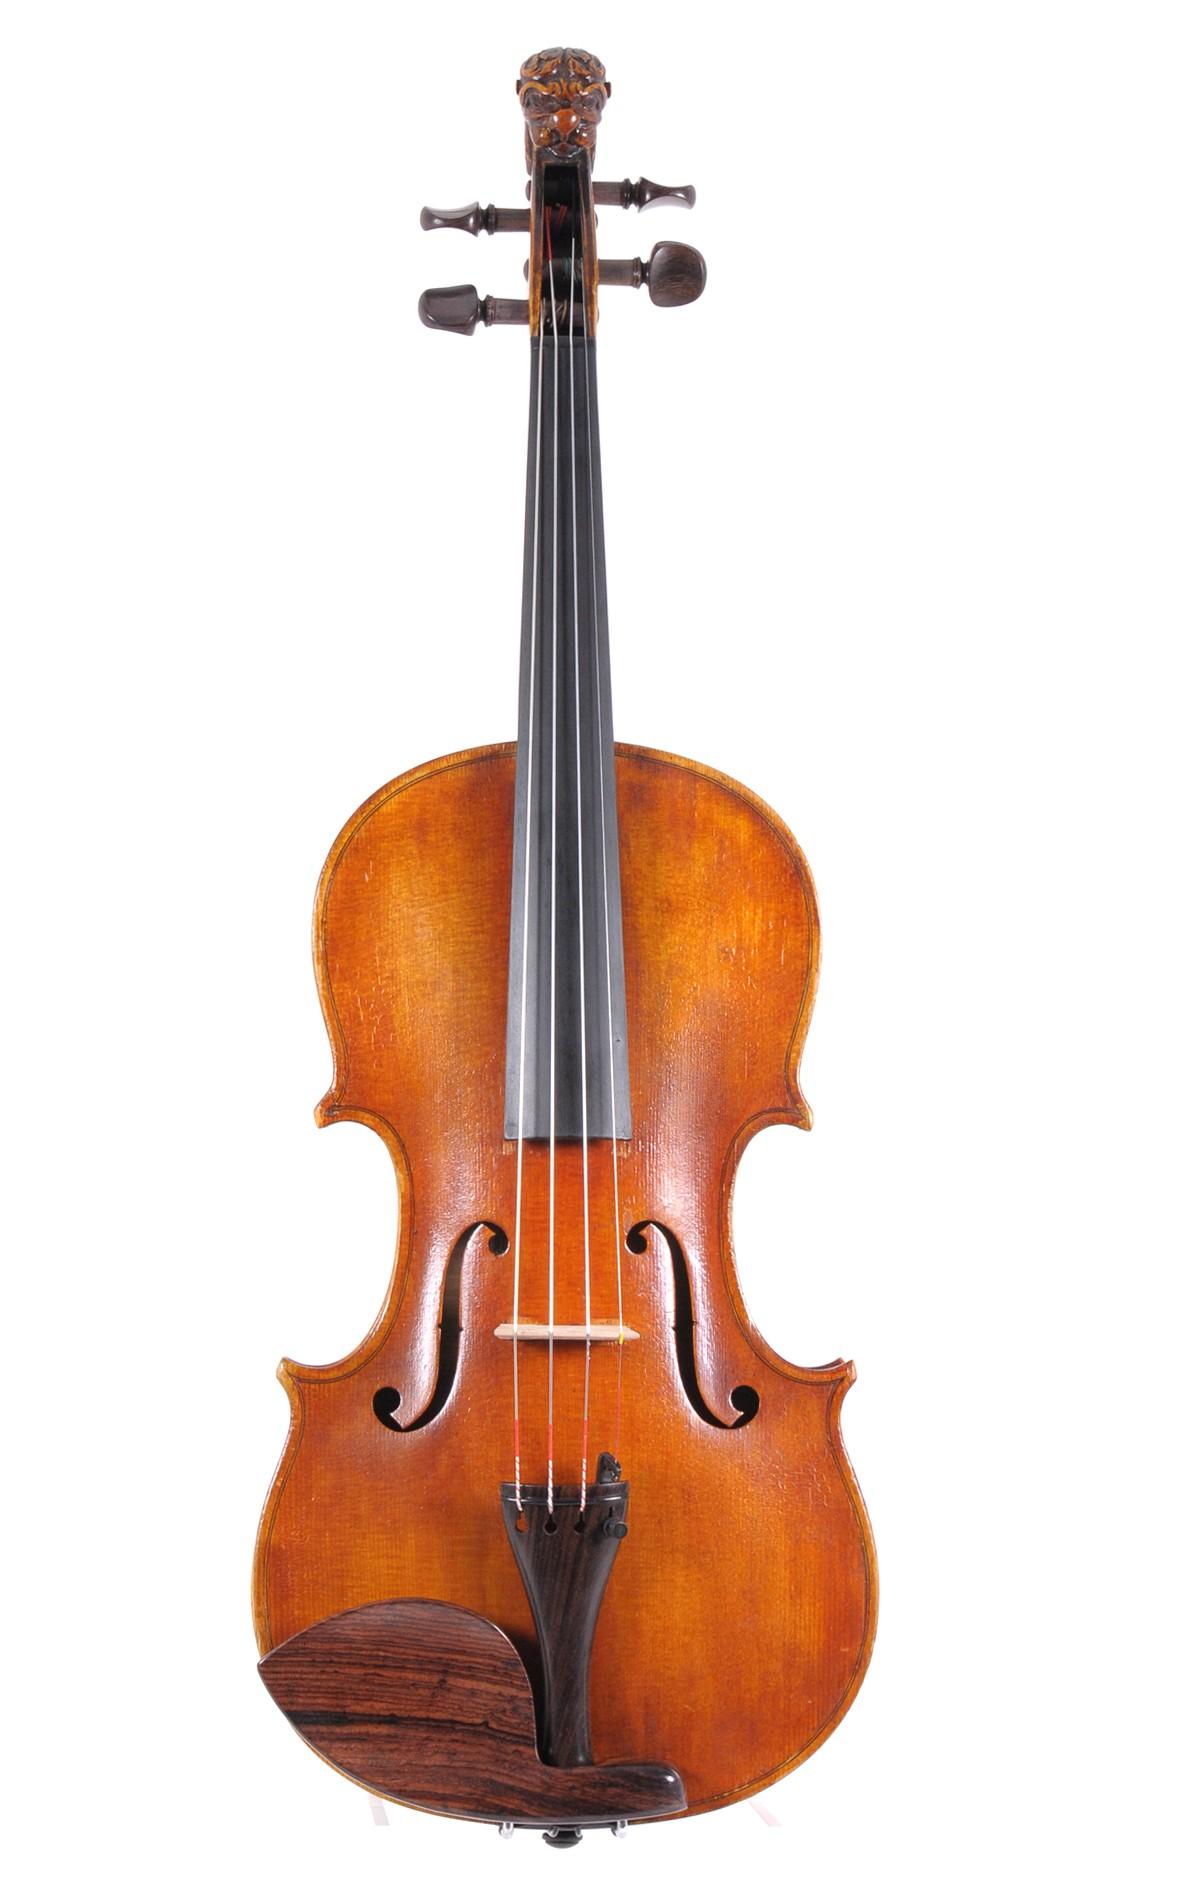 Lion head violin by Andreas Ebner, München, 1910